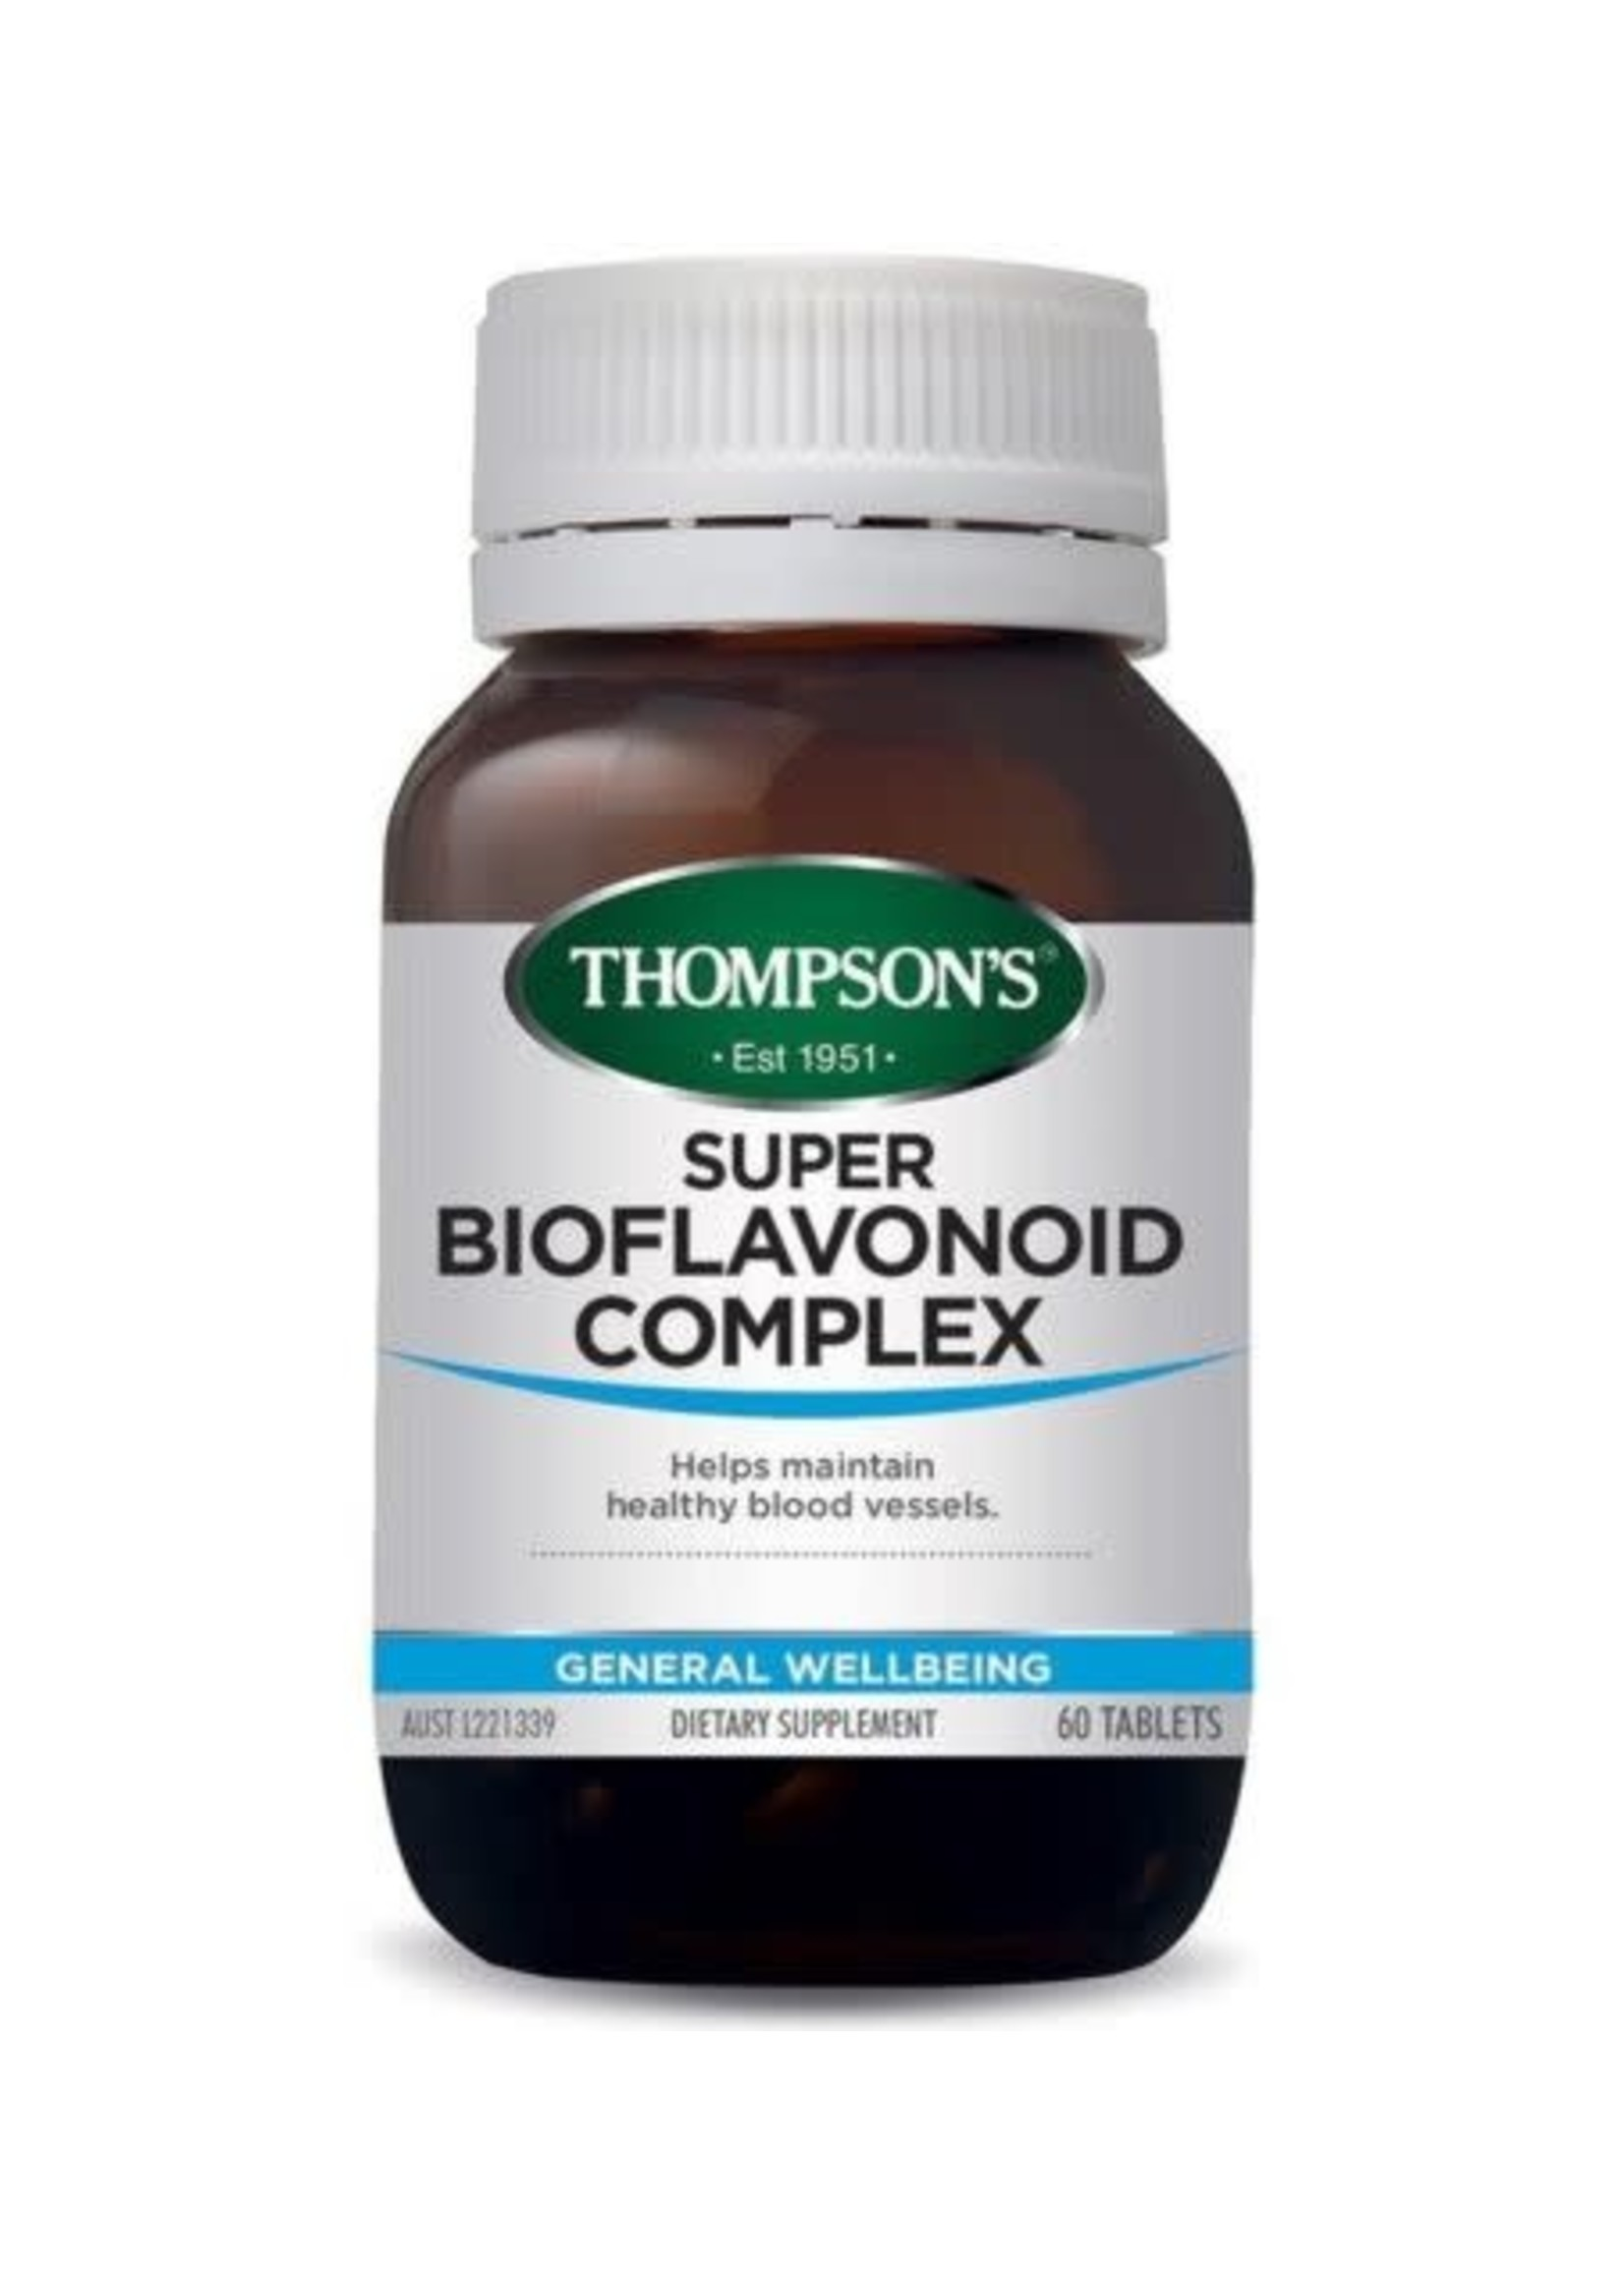 Thompsons THOMPSONS SUPER BIOFLAVONOID COMPLEX 60 TABLETS